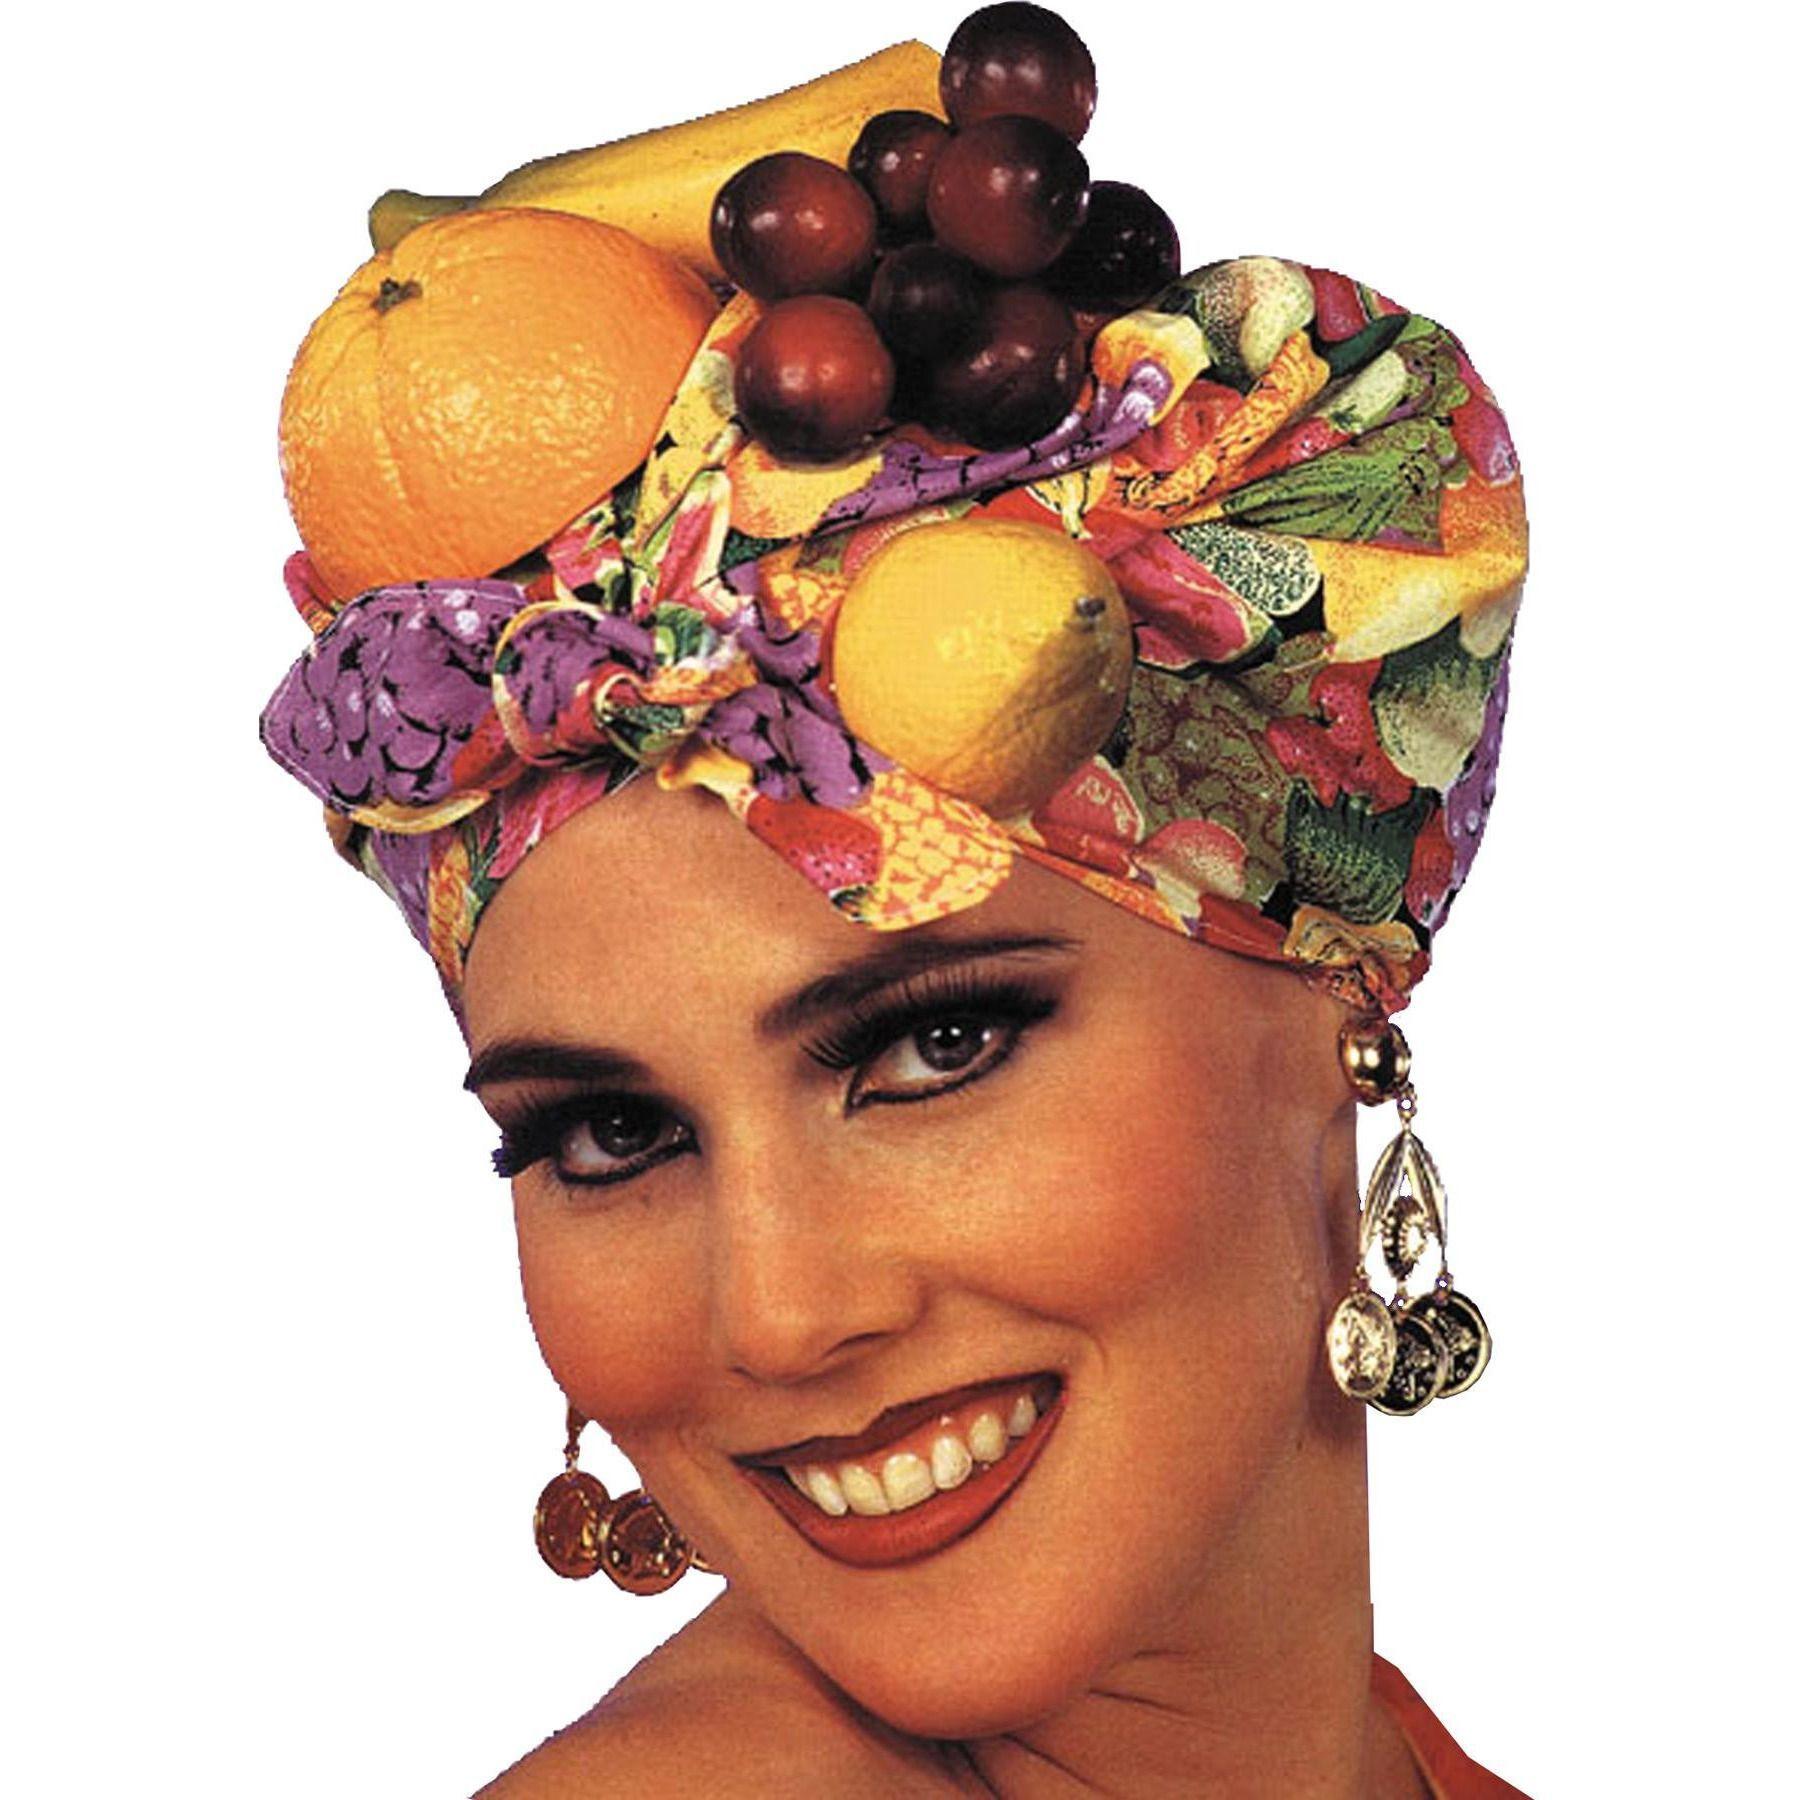 Fruit Hat Carmen Miranda Chiquita Banana Samba Feather Showgirl Adult Womens